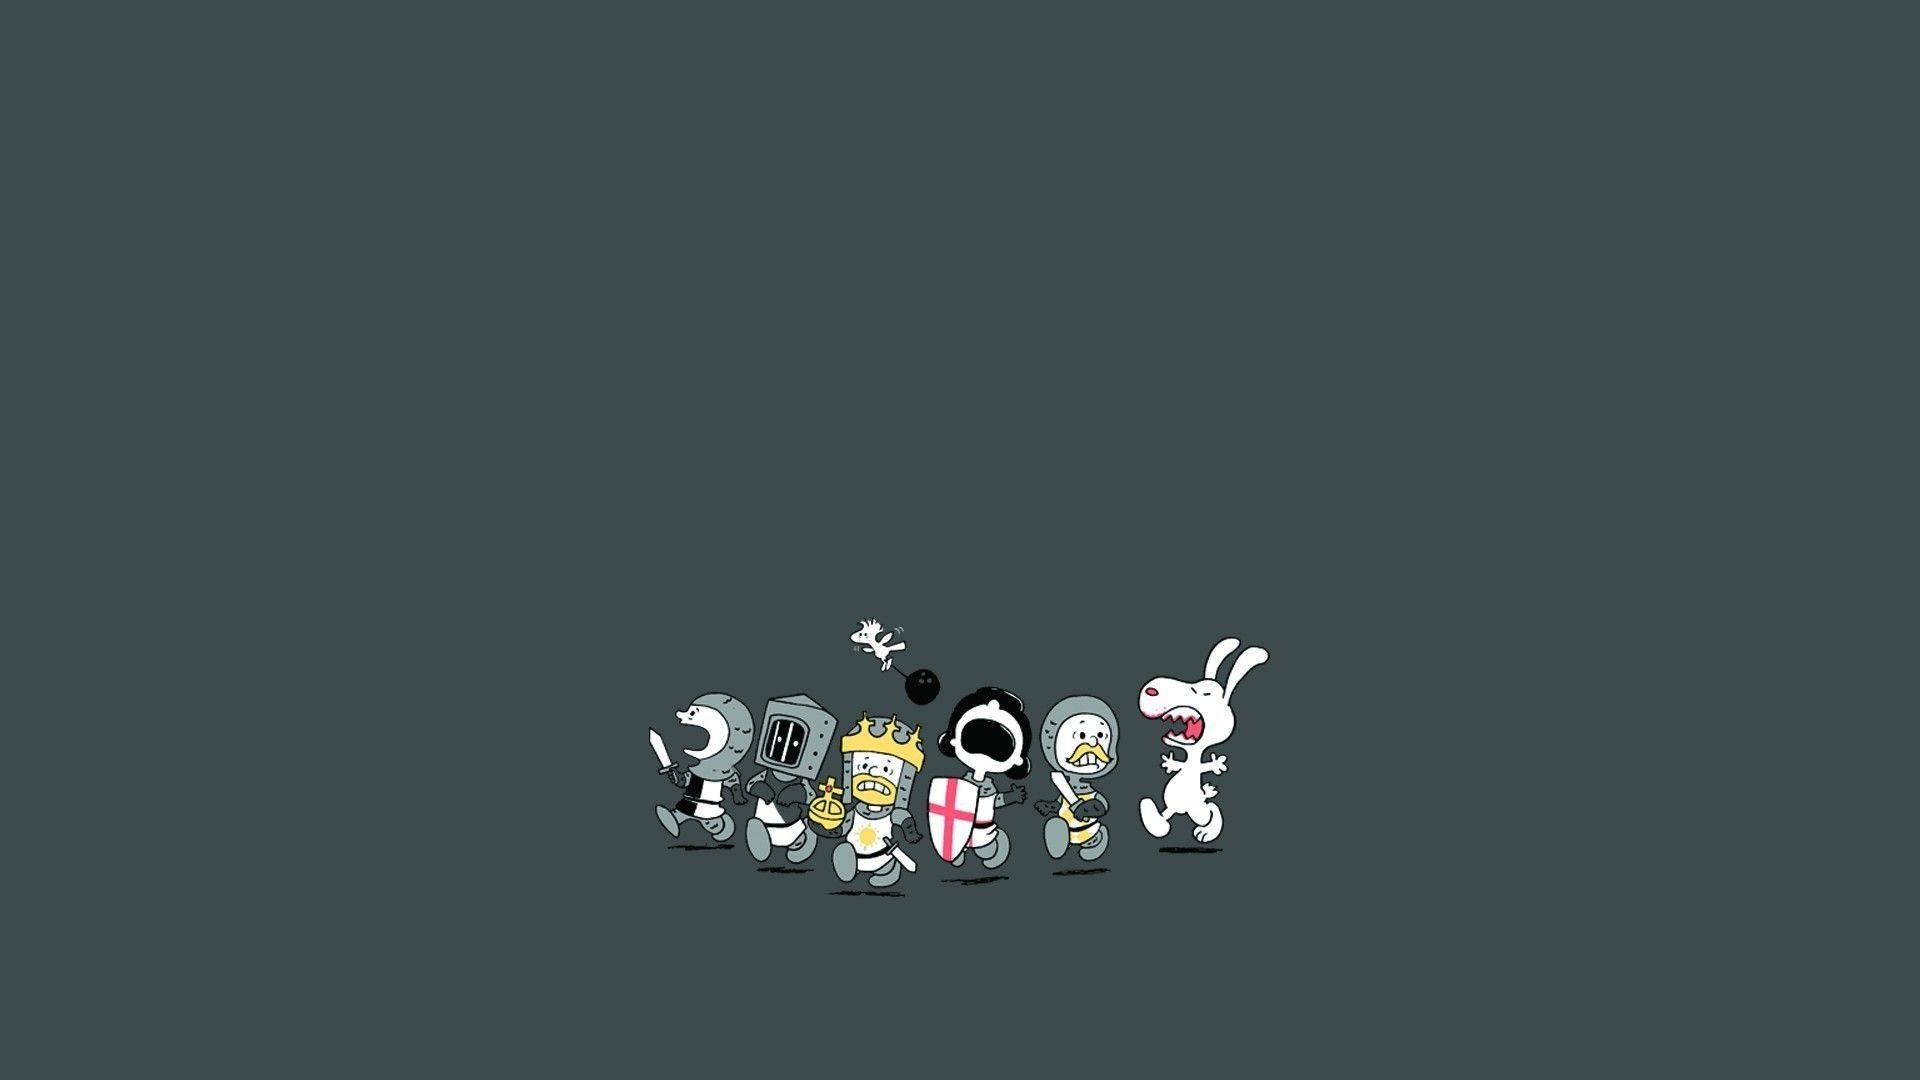 Snoopy Halloween Desktop Wallpaper スヌーピー Pc 壁紙 イラスト